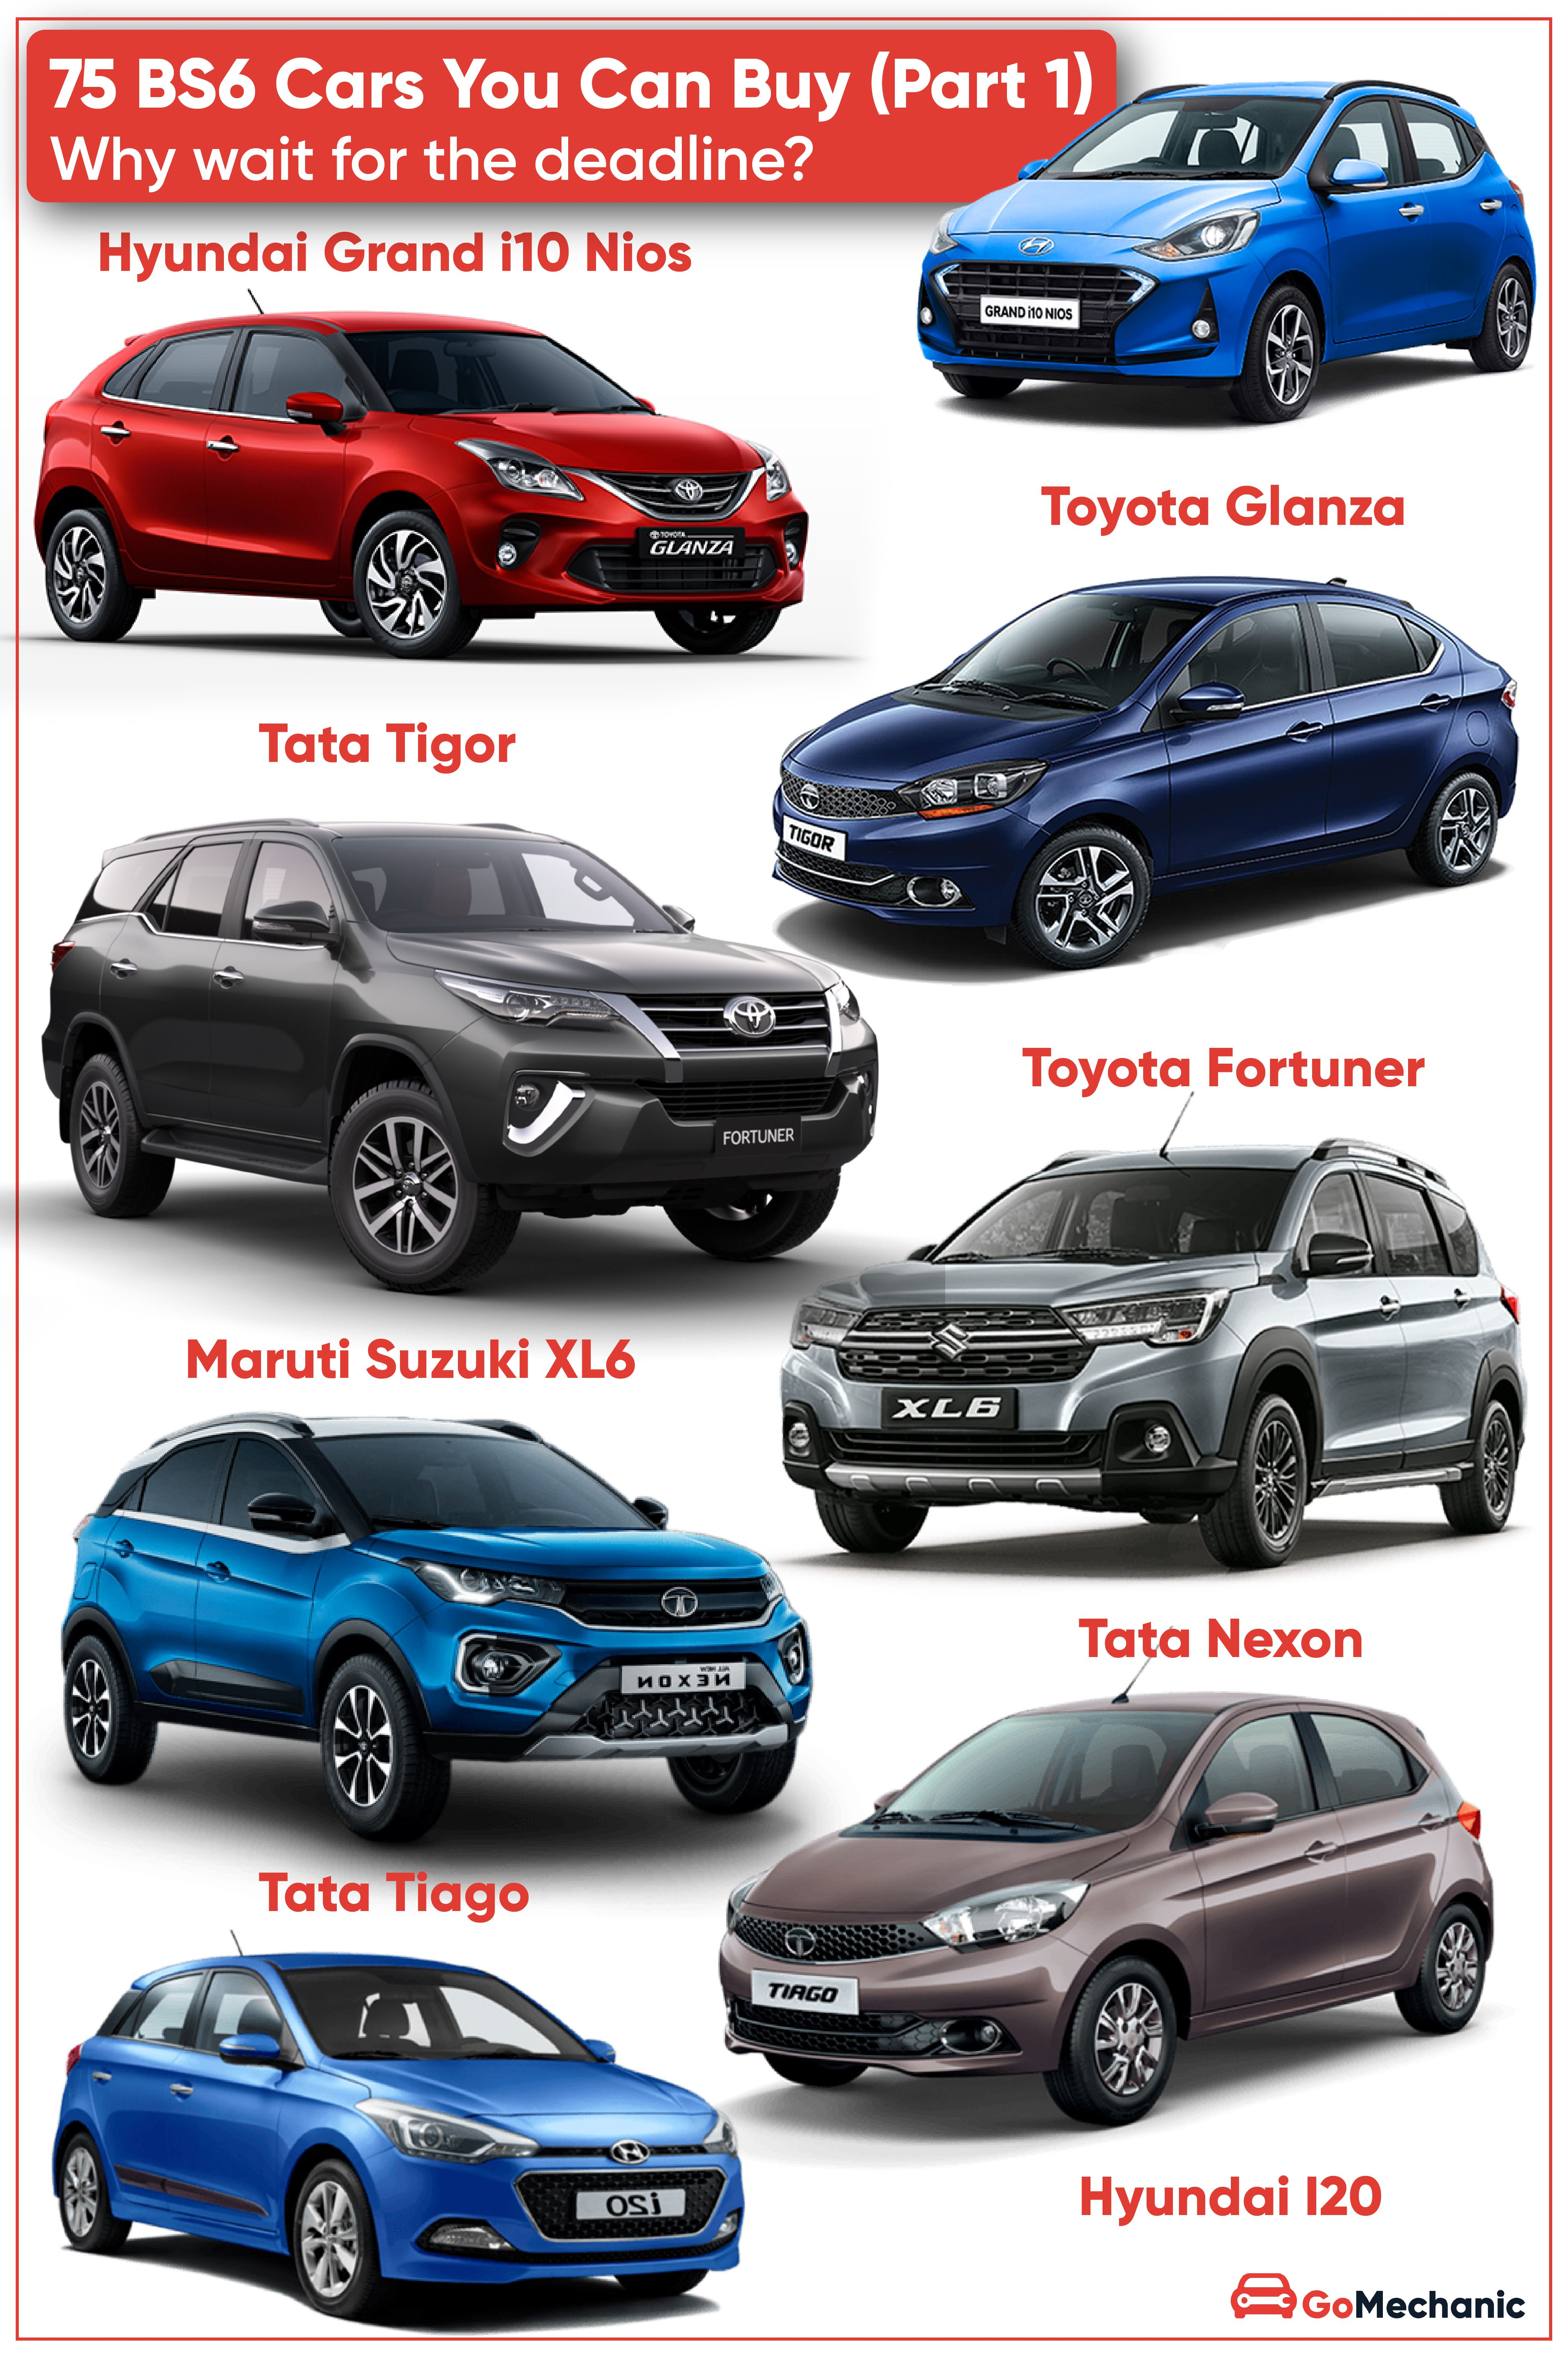 75 Bs6 Cars You Can Buy Why Wait For The Deadline In 2020 Suzuki Wagon R Hyundai Motor Wagon R